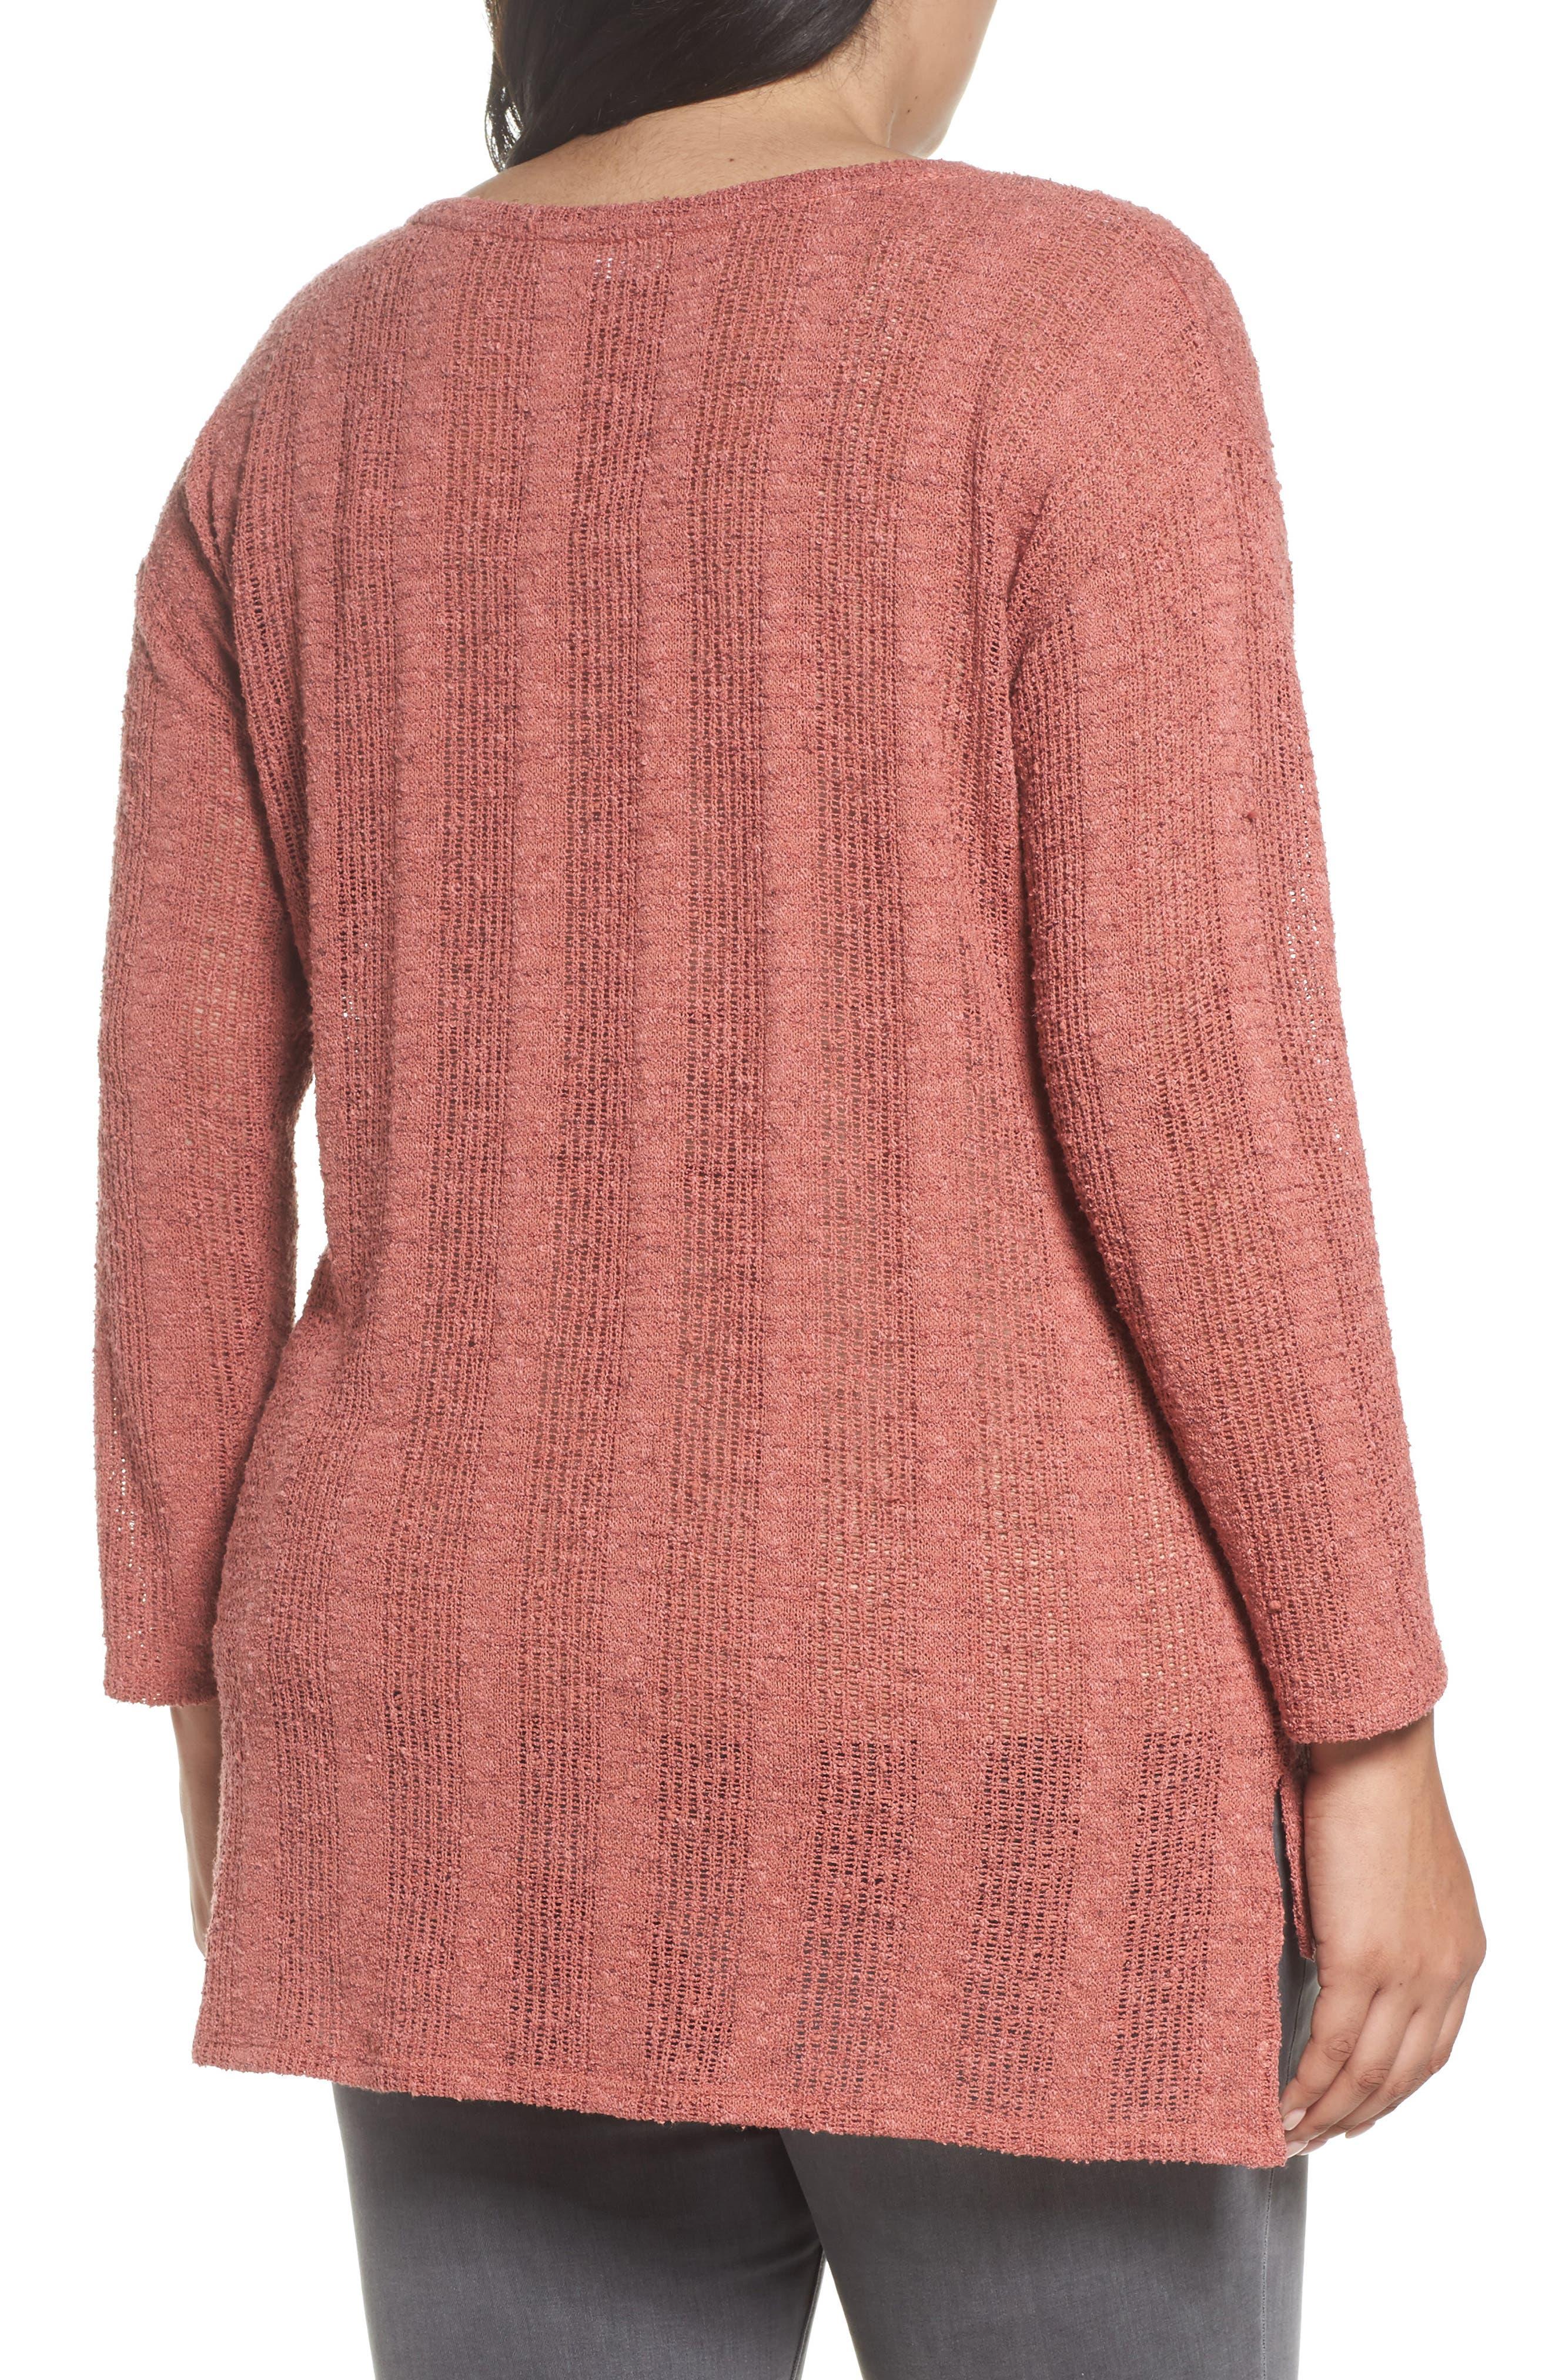 Drop Needle Sweater,                             Alternate thumbnail 2, color,